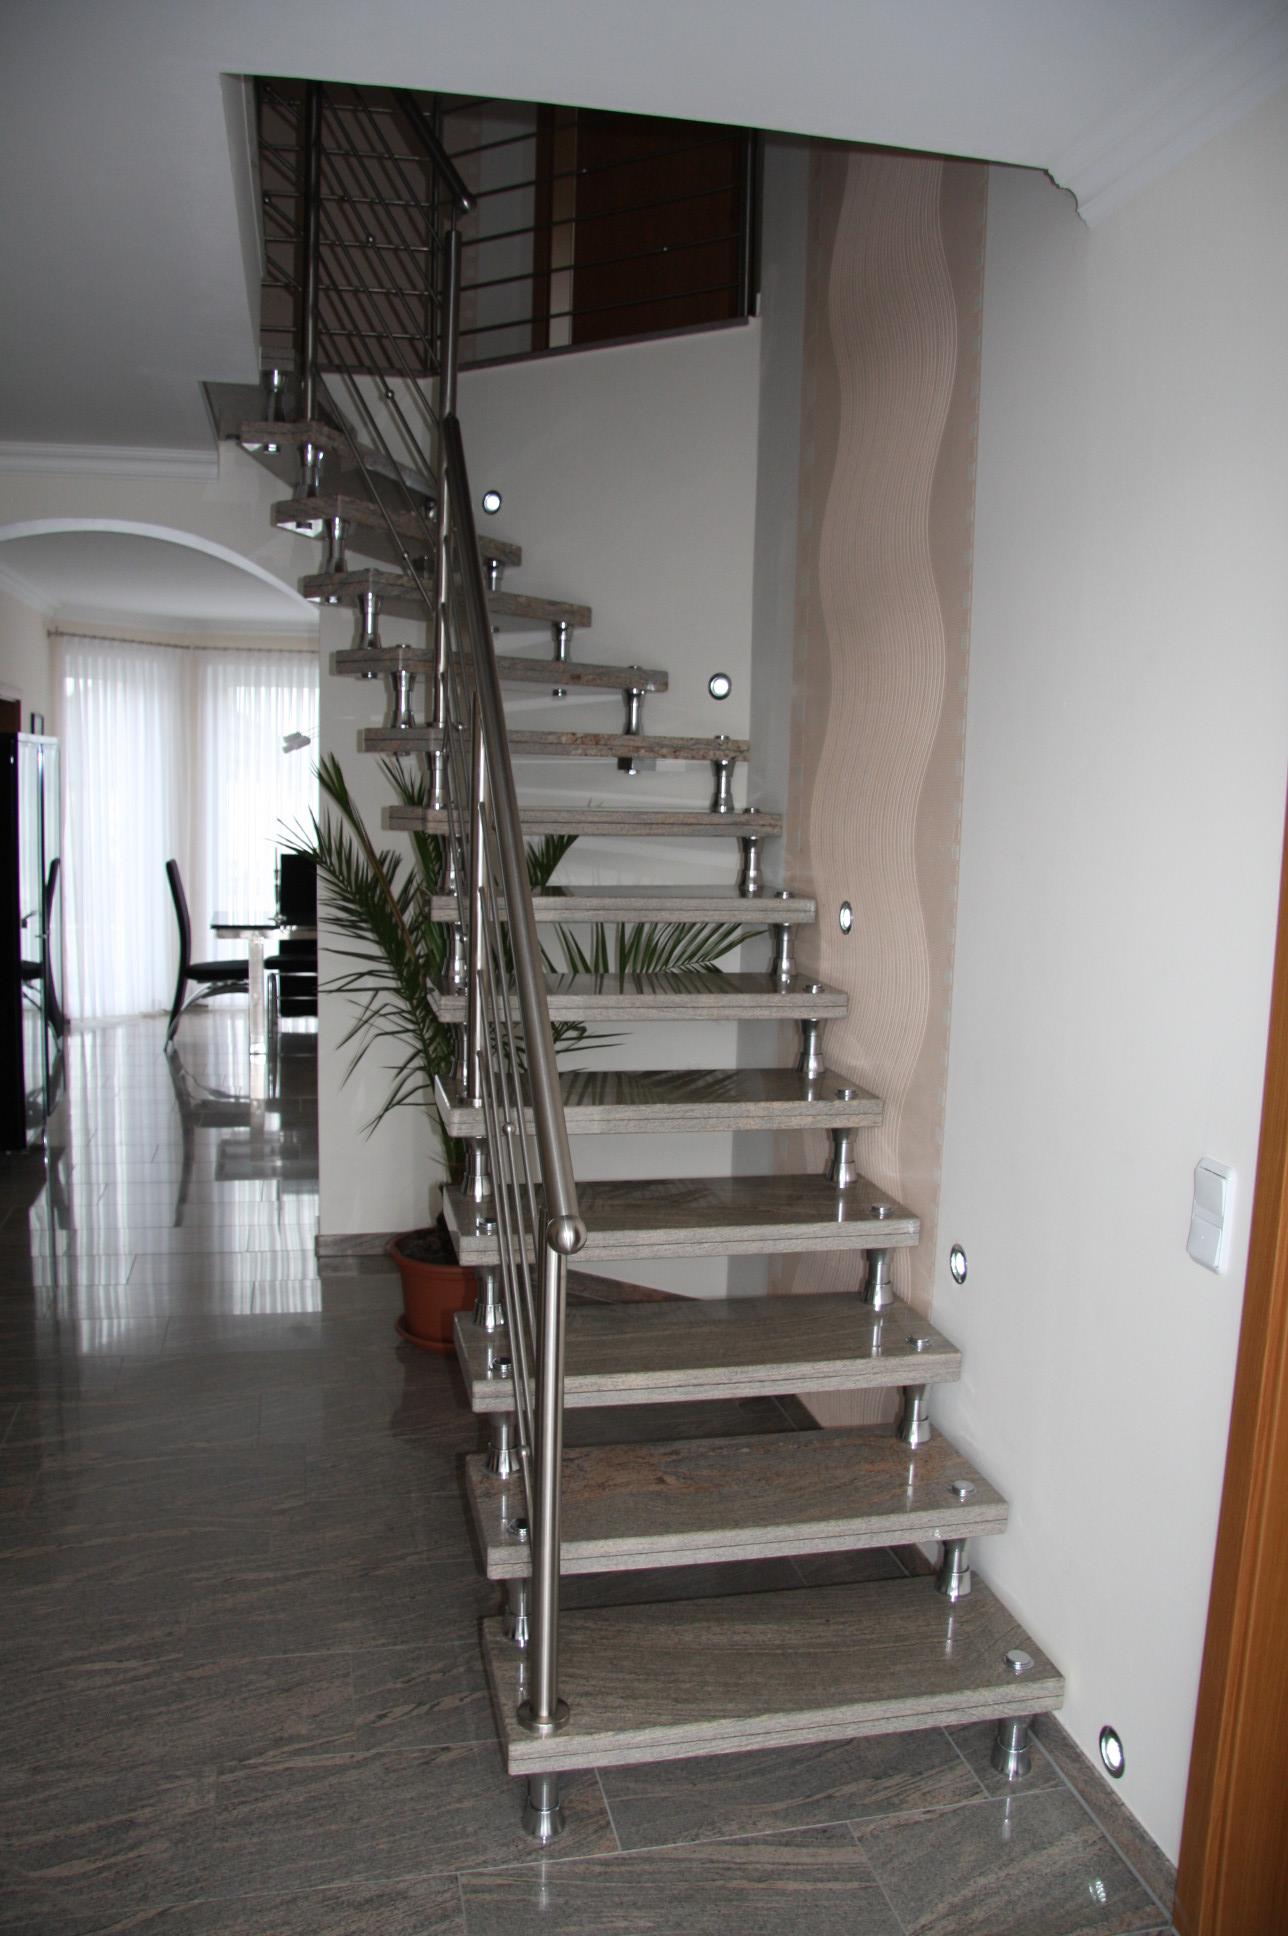 grau-braune Granit Treppe